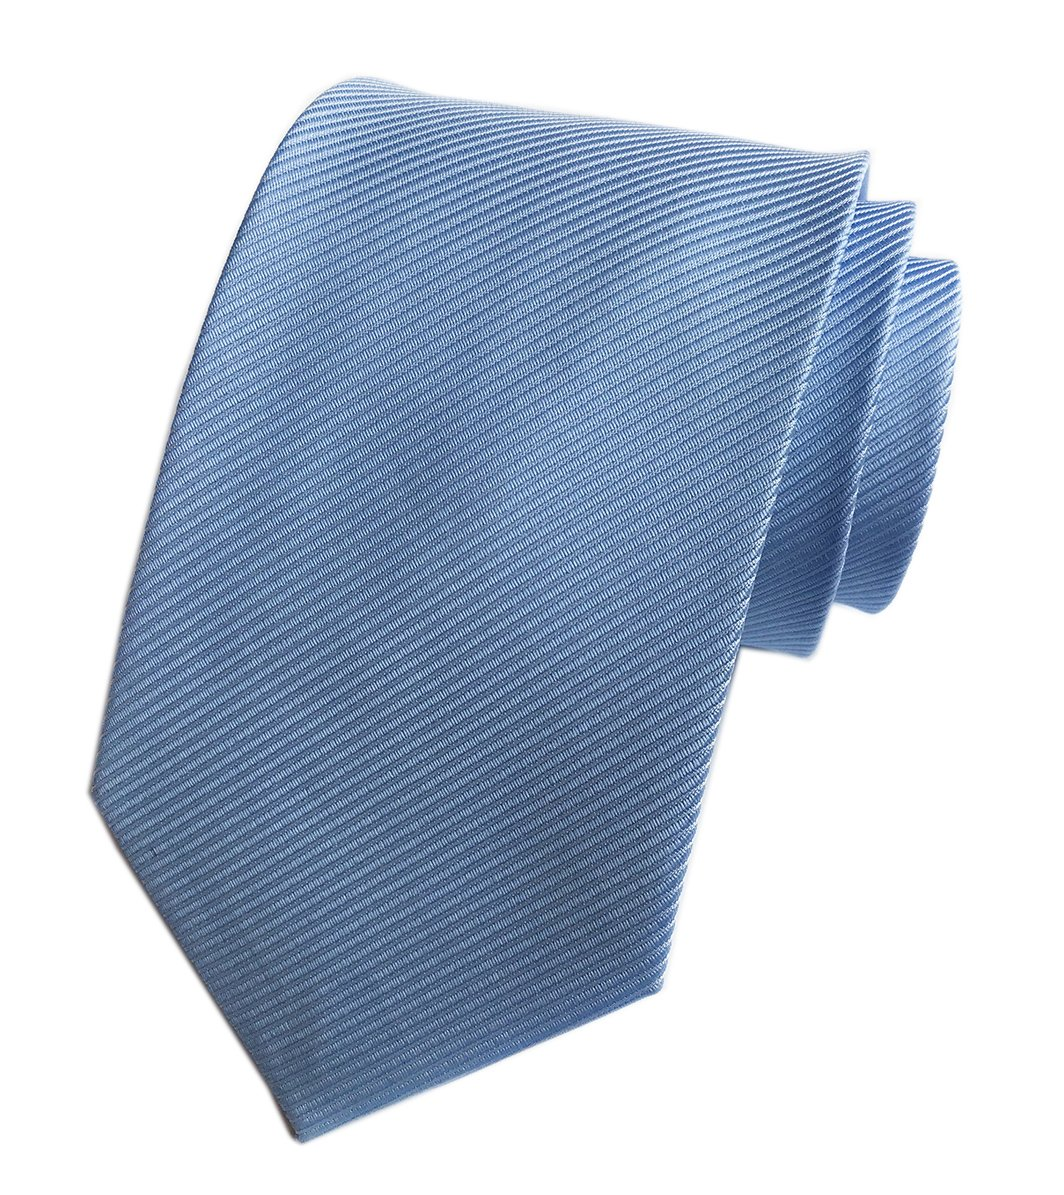 Elfeves Men's Sky Blue Silk Self Cravat Ball Party Ties 3'' width Woven for Gift